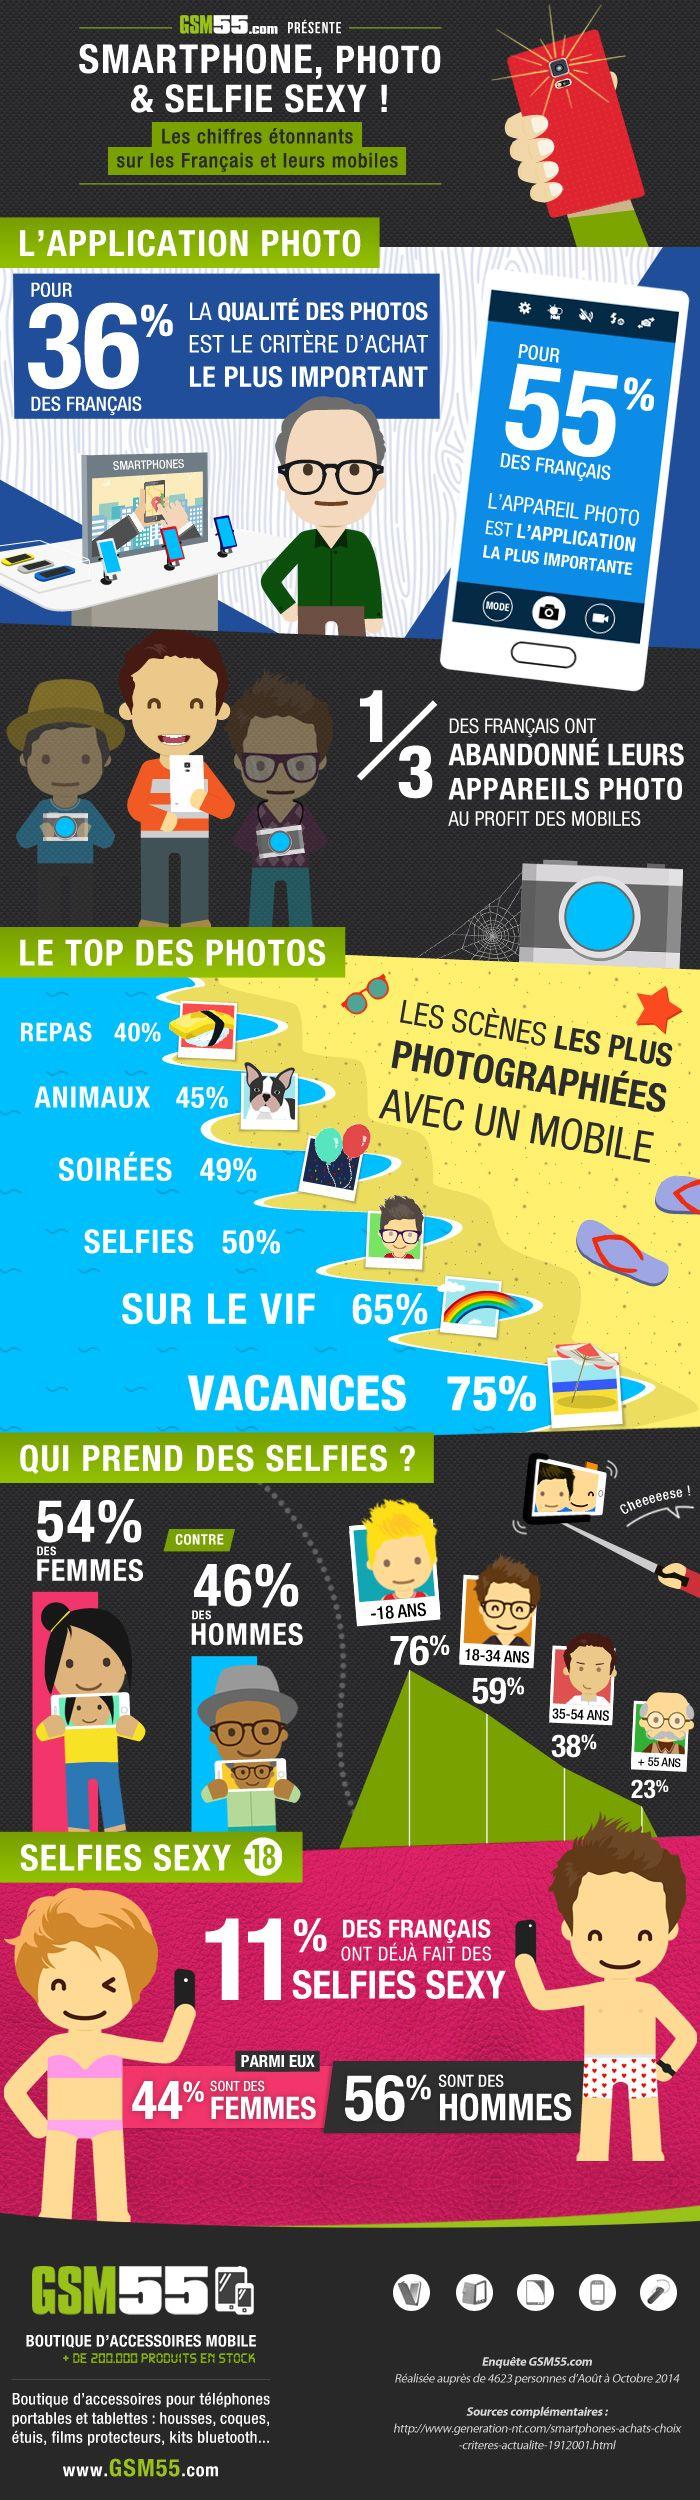 infographie smartphone photo